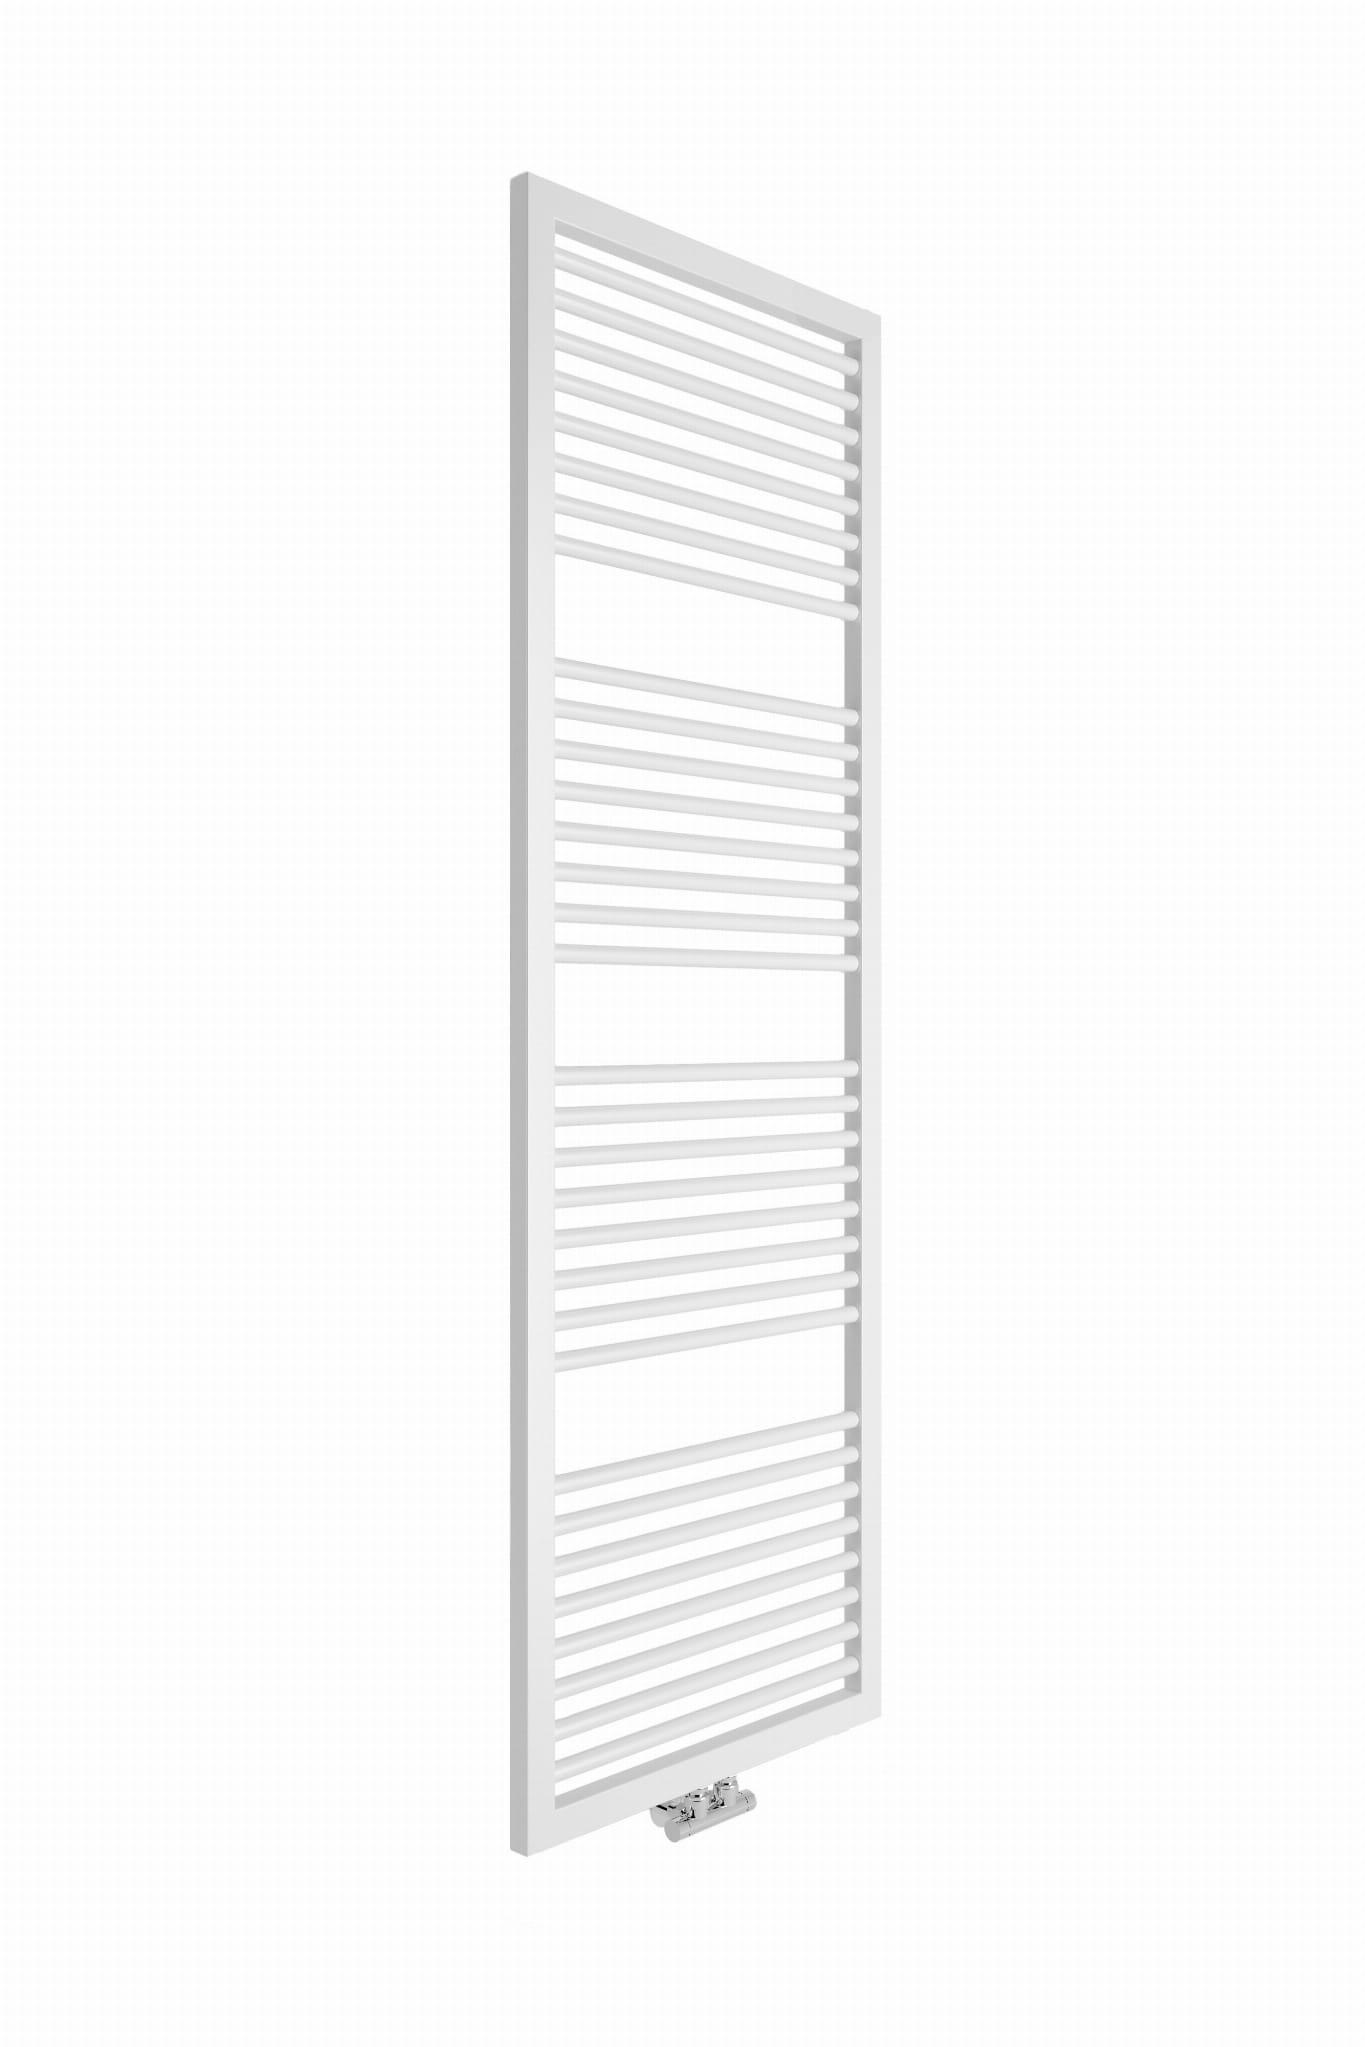 Sanotechnik - RIMINI - Kúpeľňové kúrenie biele 823W 60 x 181,3 cm